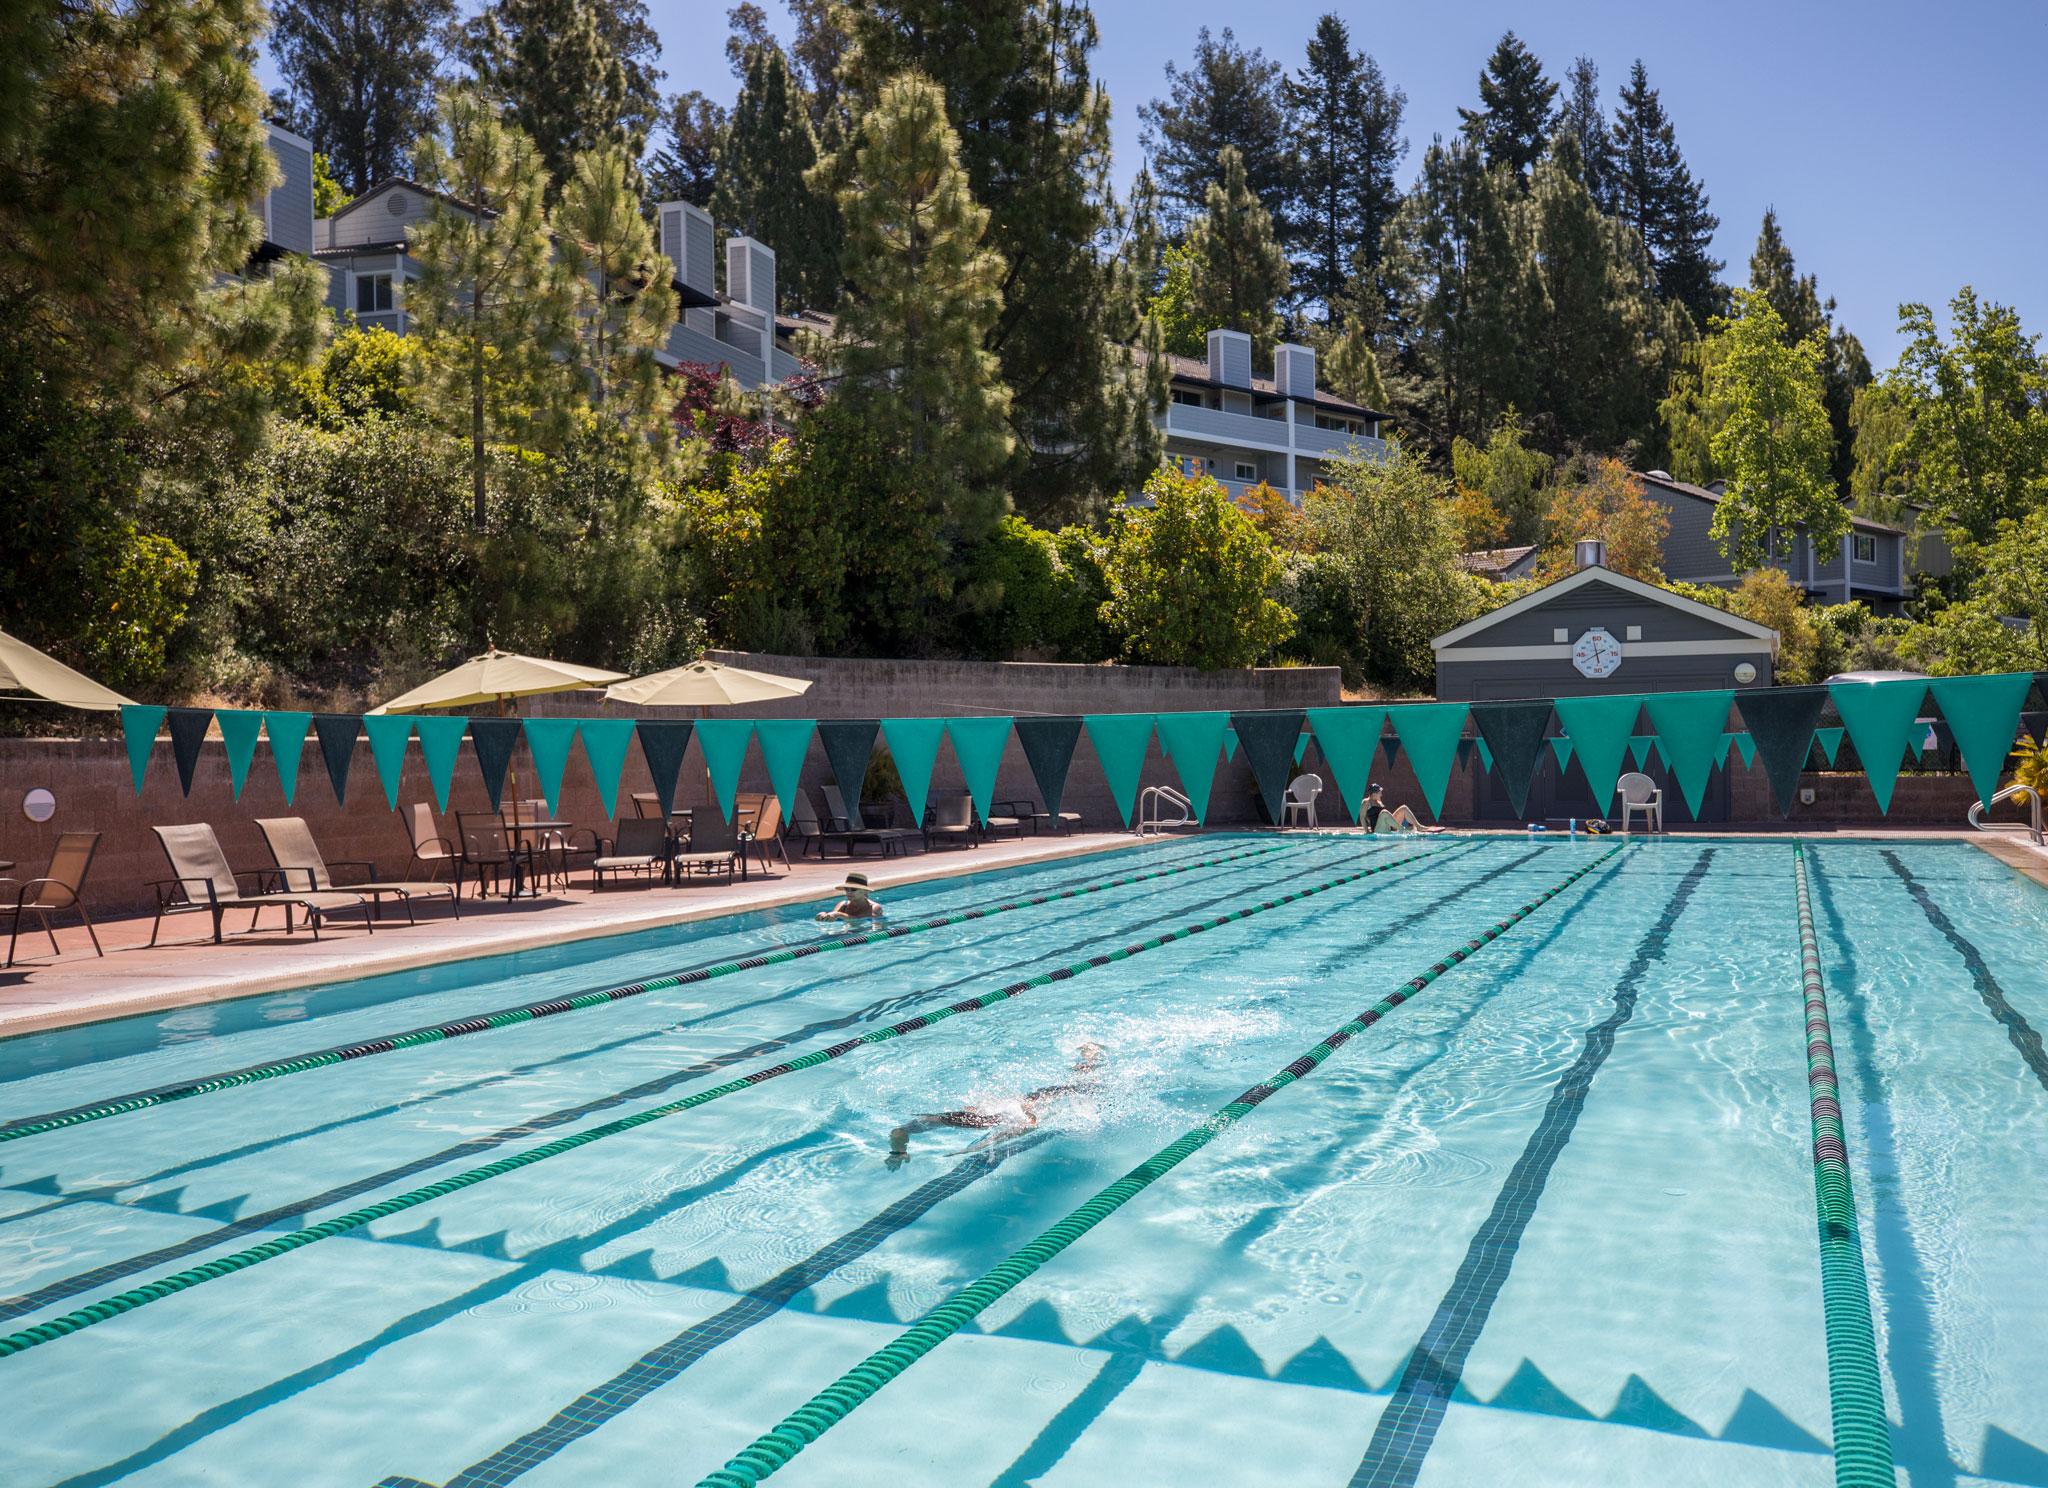 Flamingo Resort Health Club Pool